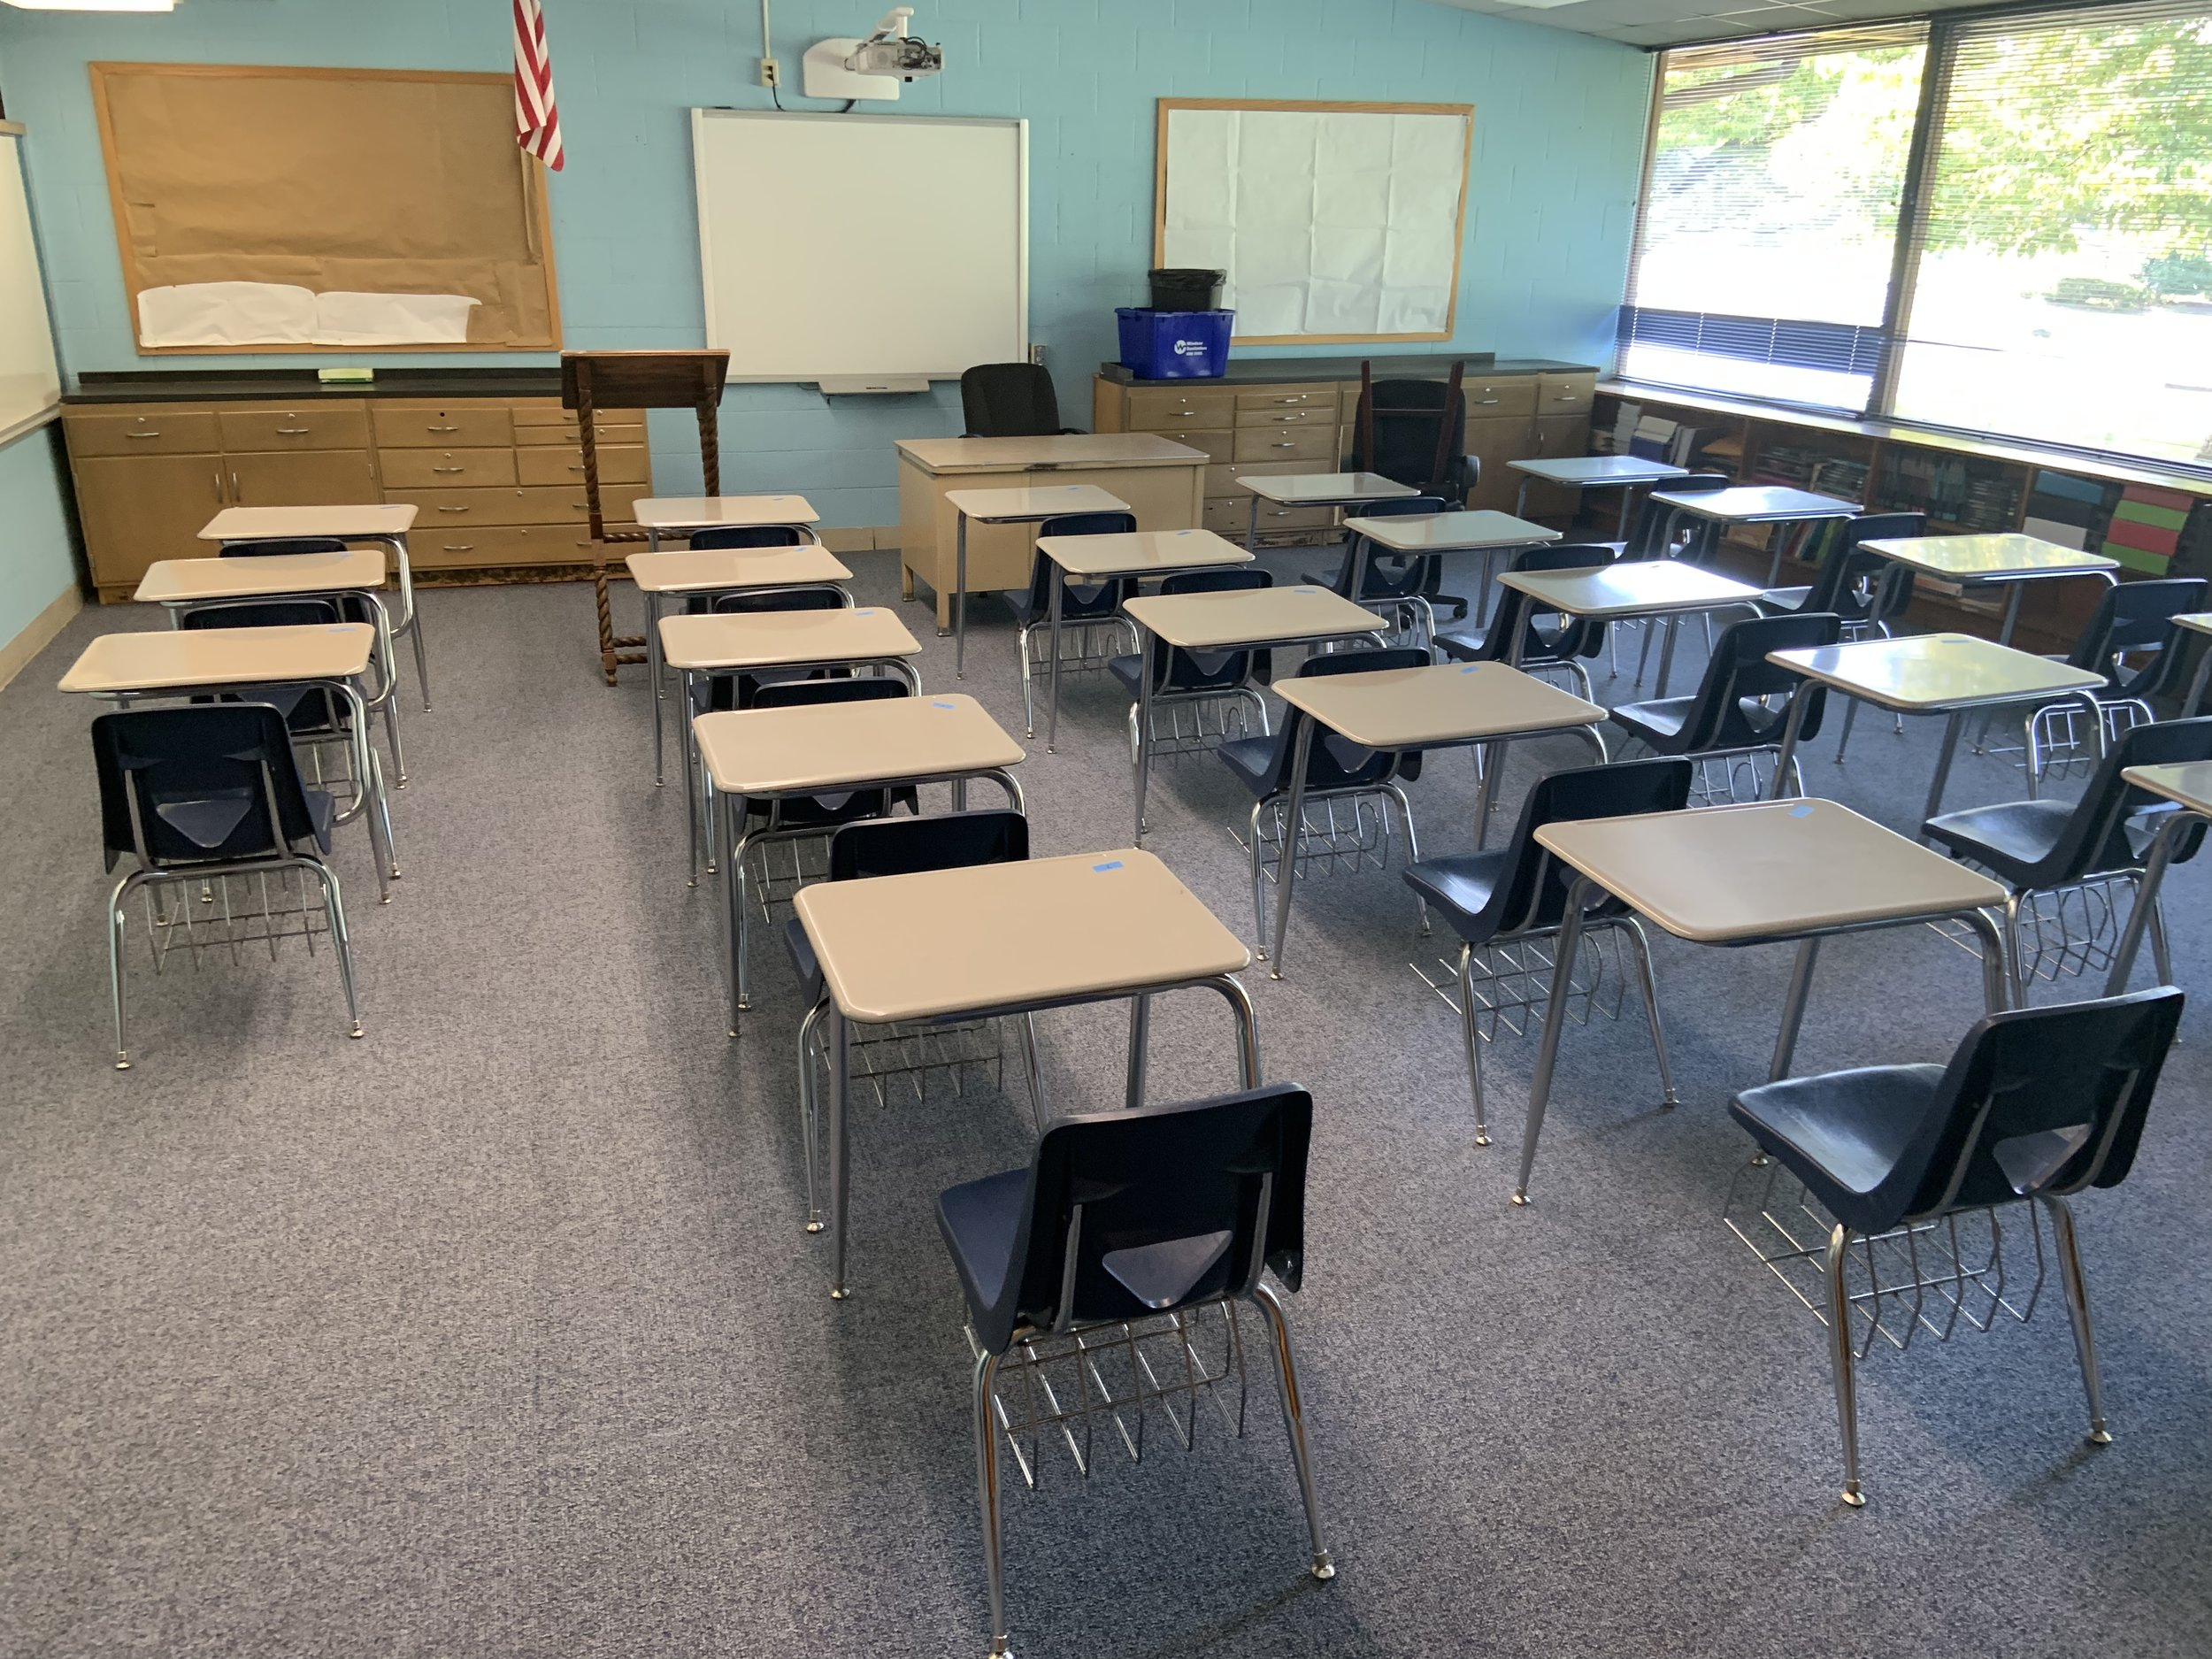 Math classroom: Check!